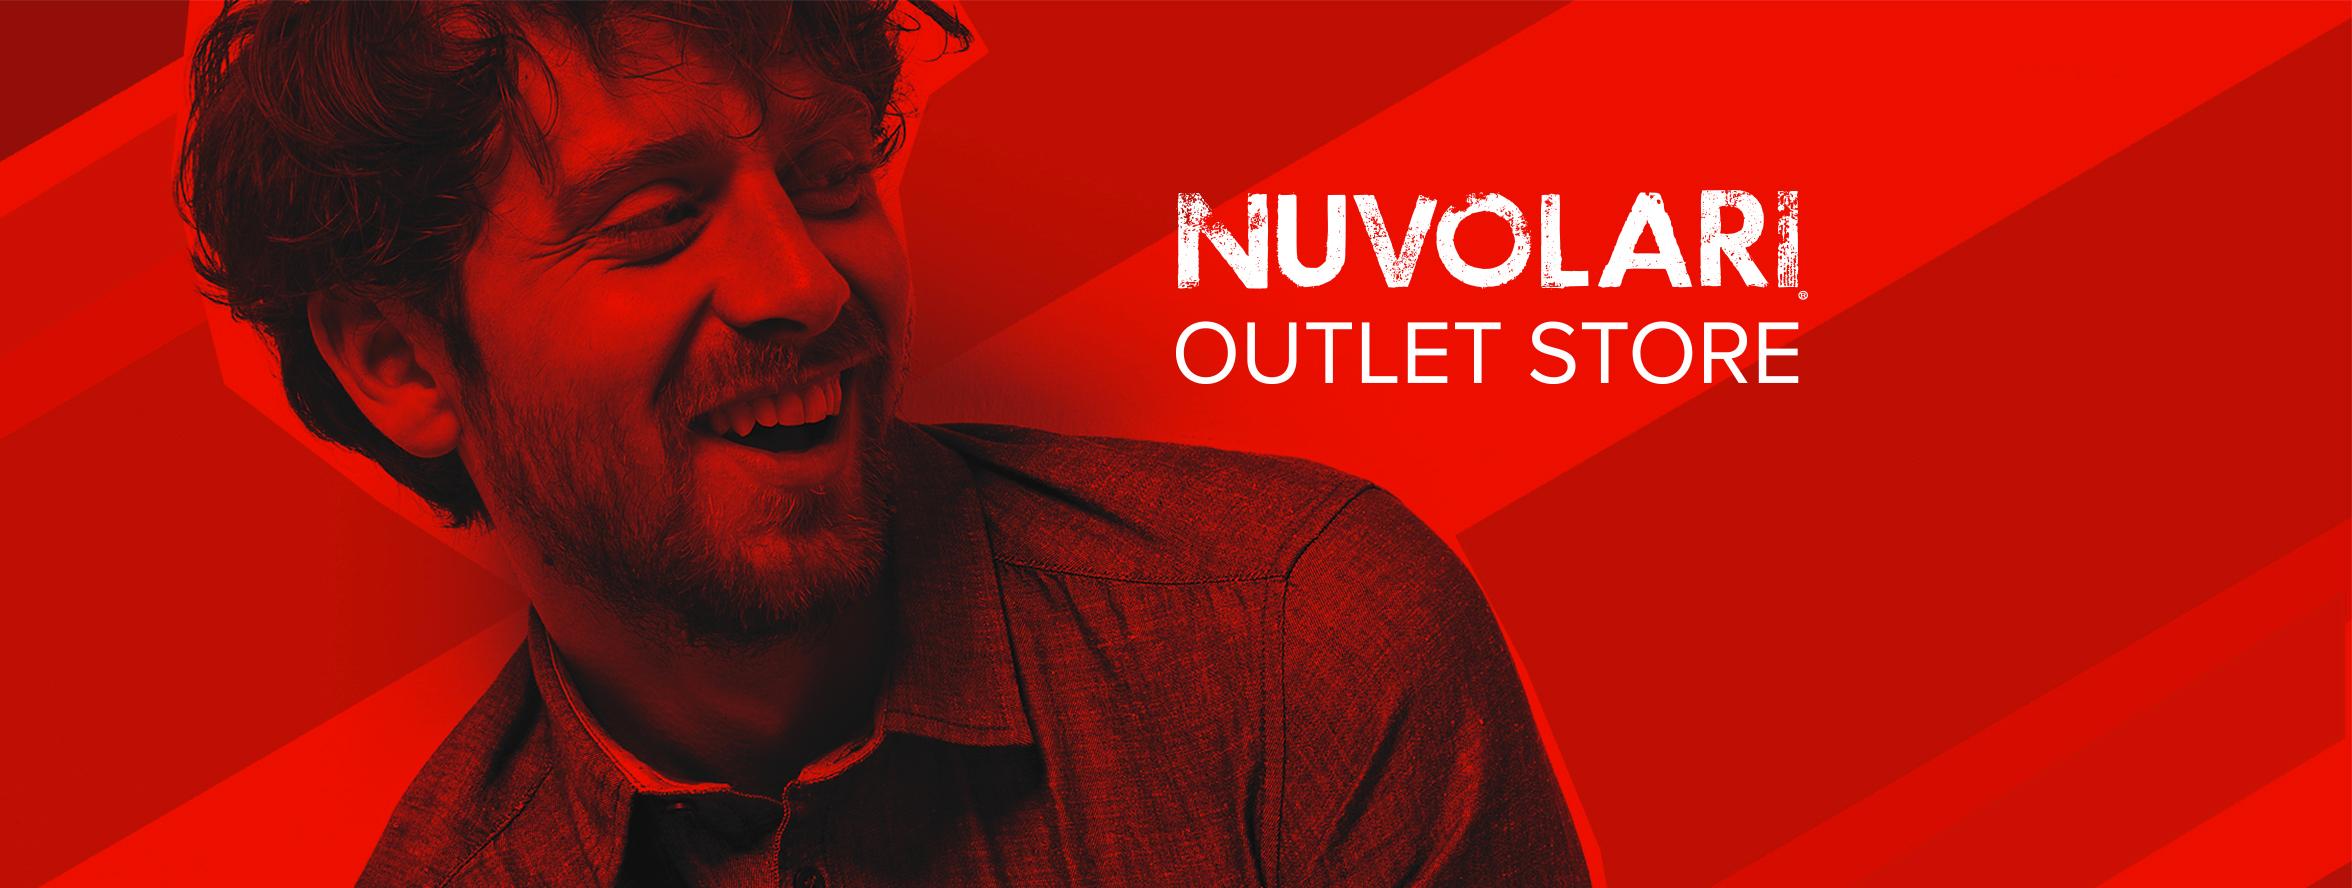 Outlet Store Nuvolari, lo shopping conveniente | Nuvolari Blog